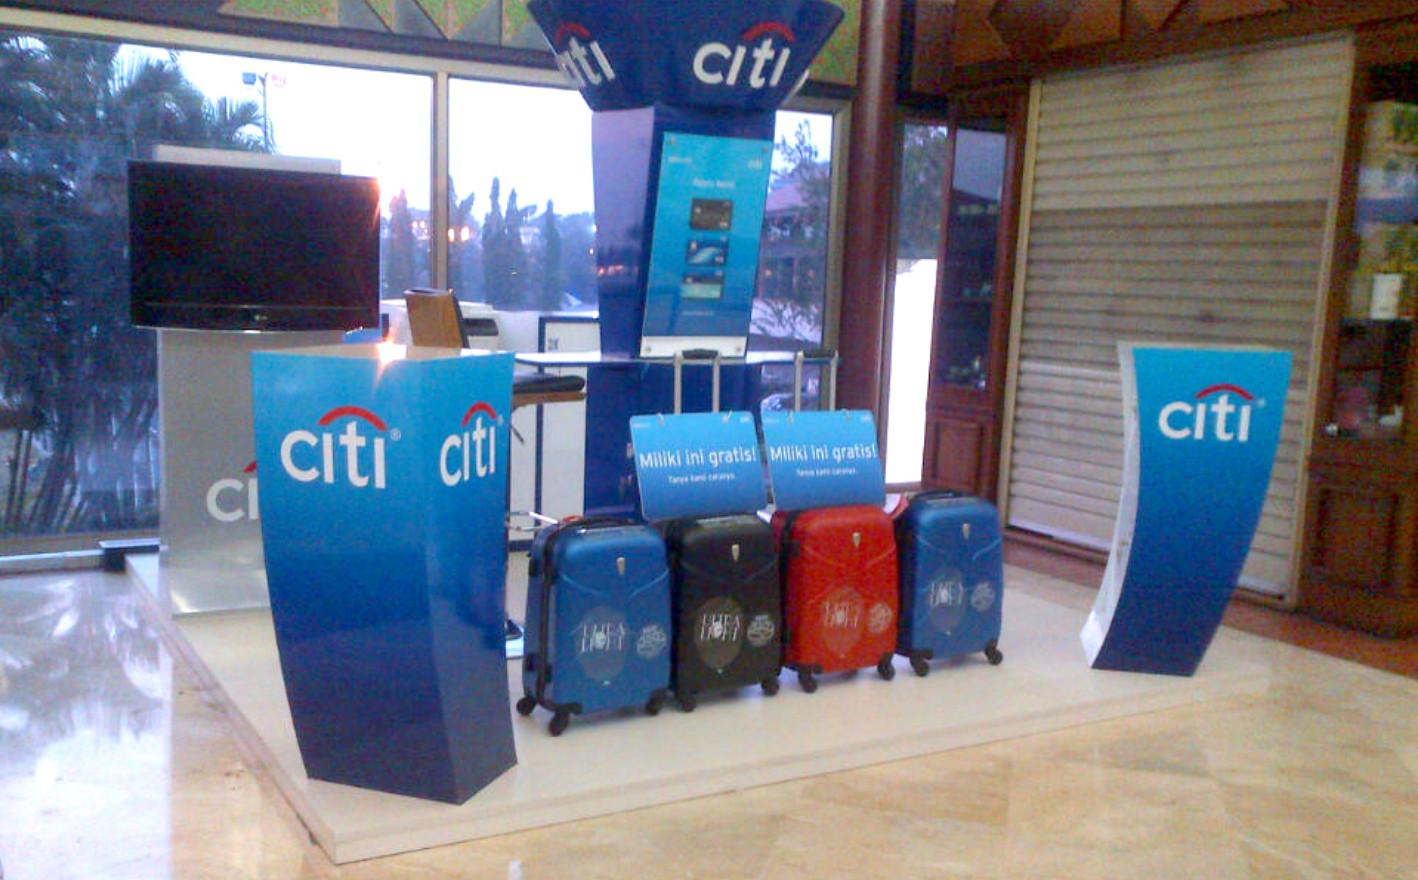 Citi Bank Booth